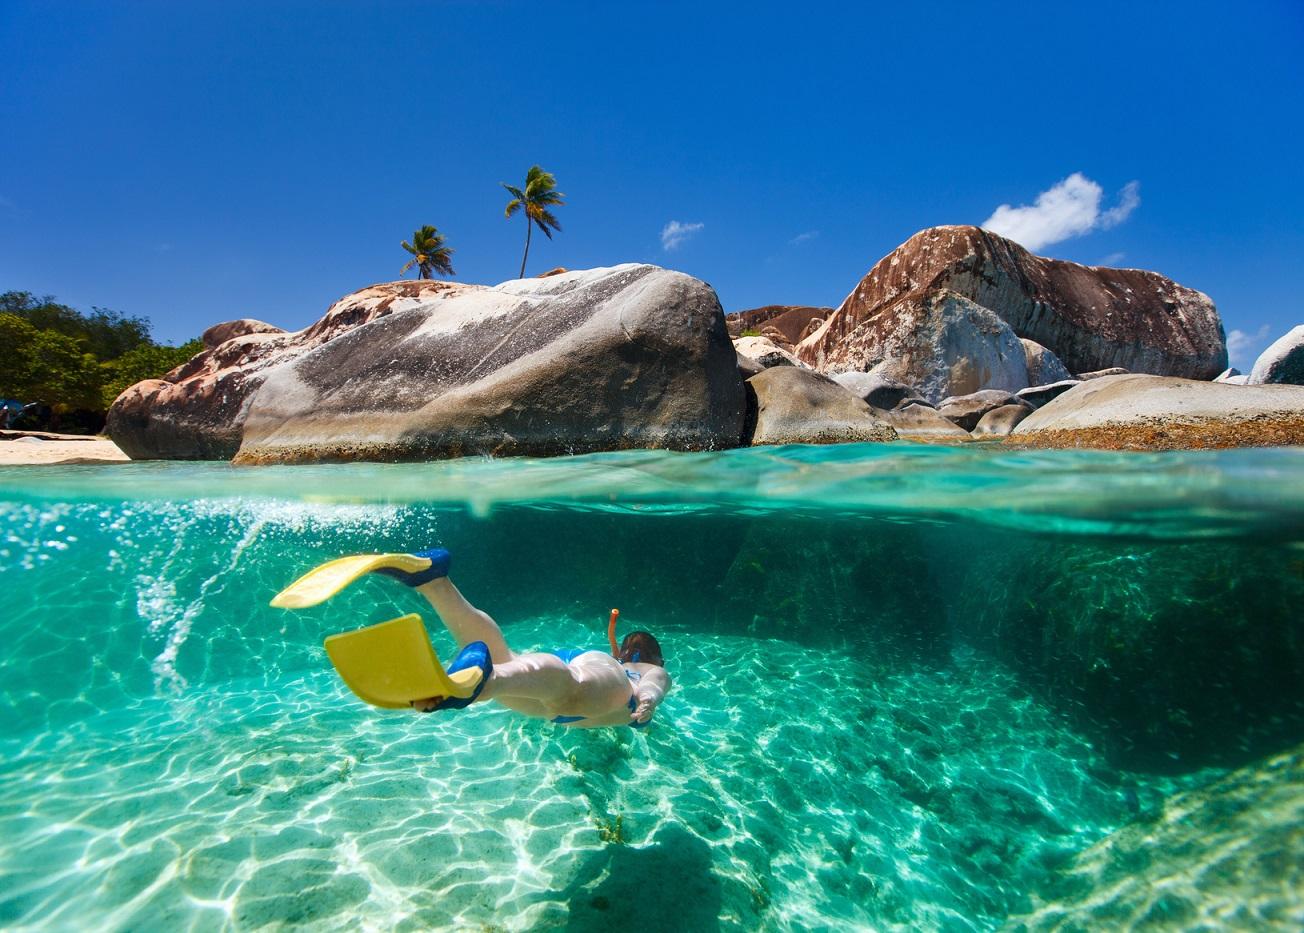 sailing holidays in Tortola, British Virgin Islands, the Caribbean